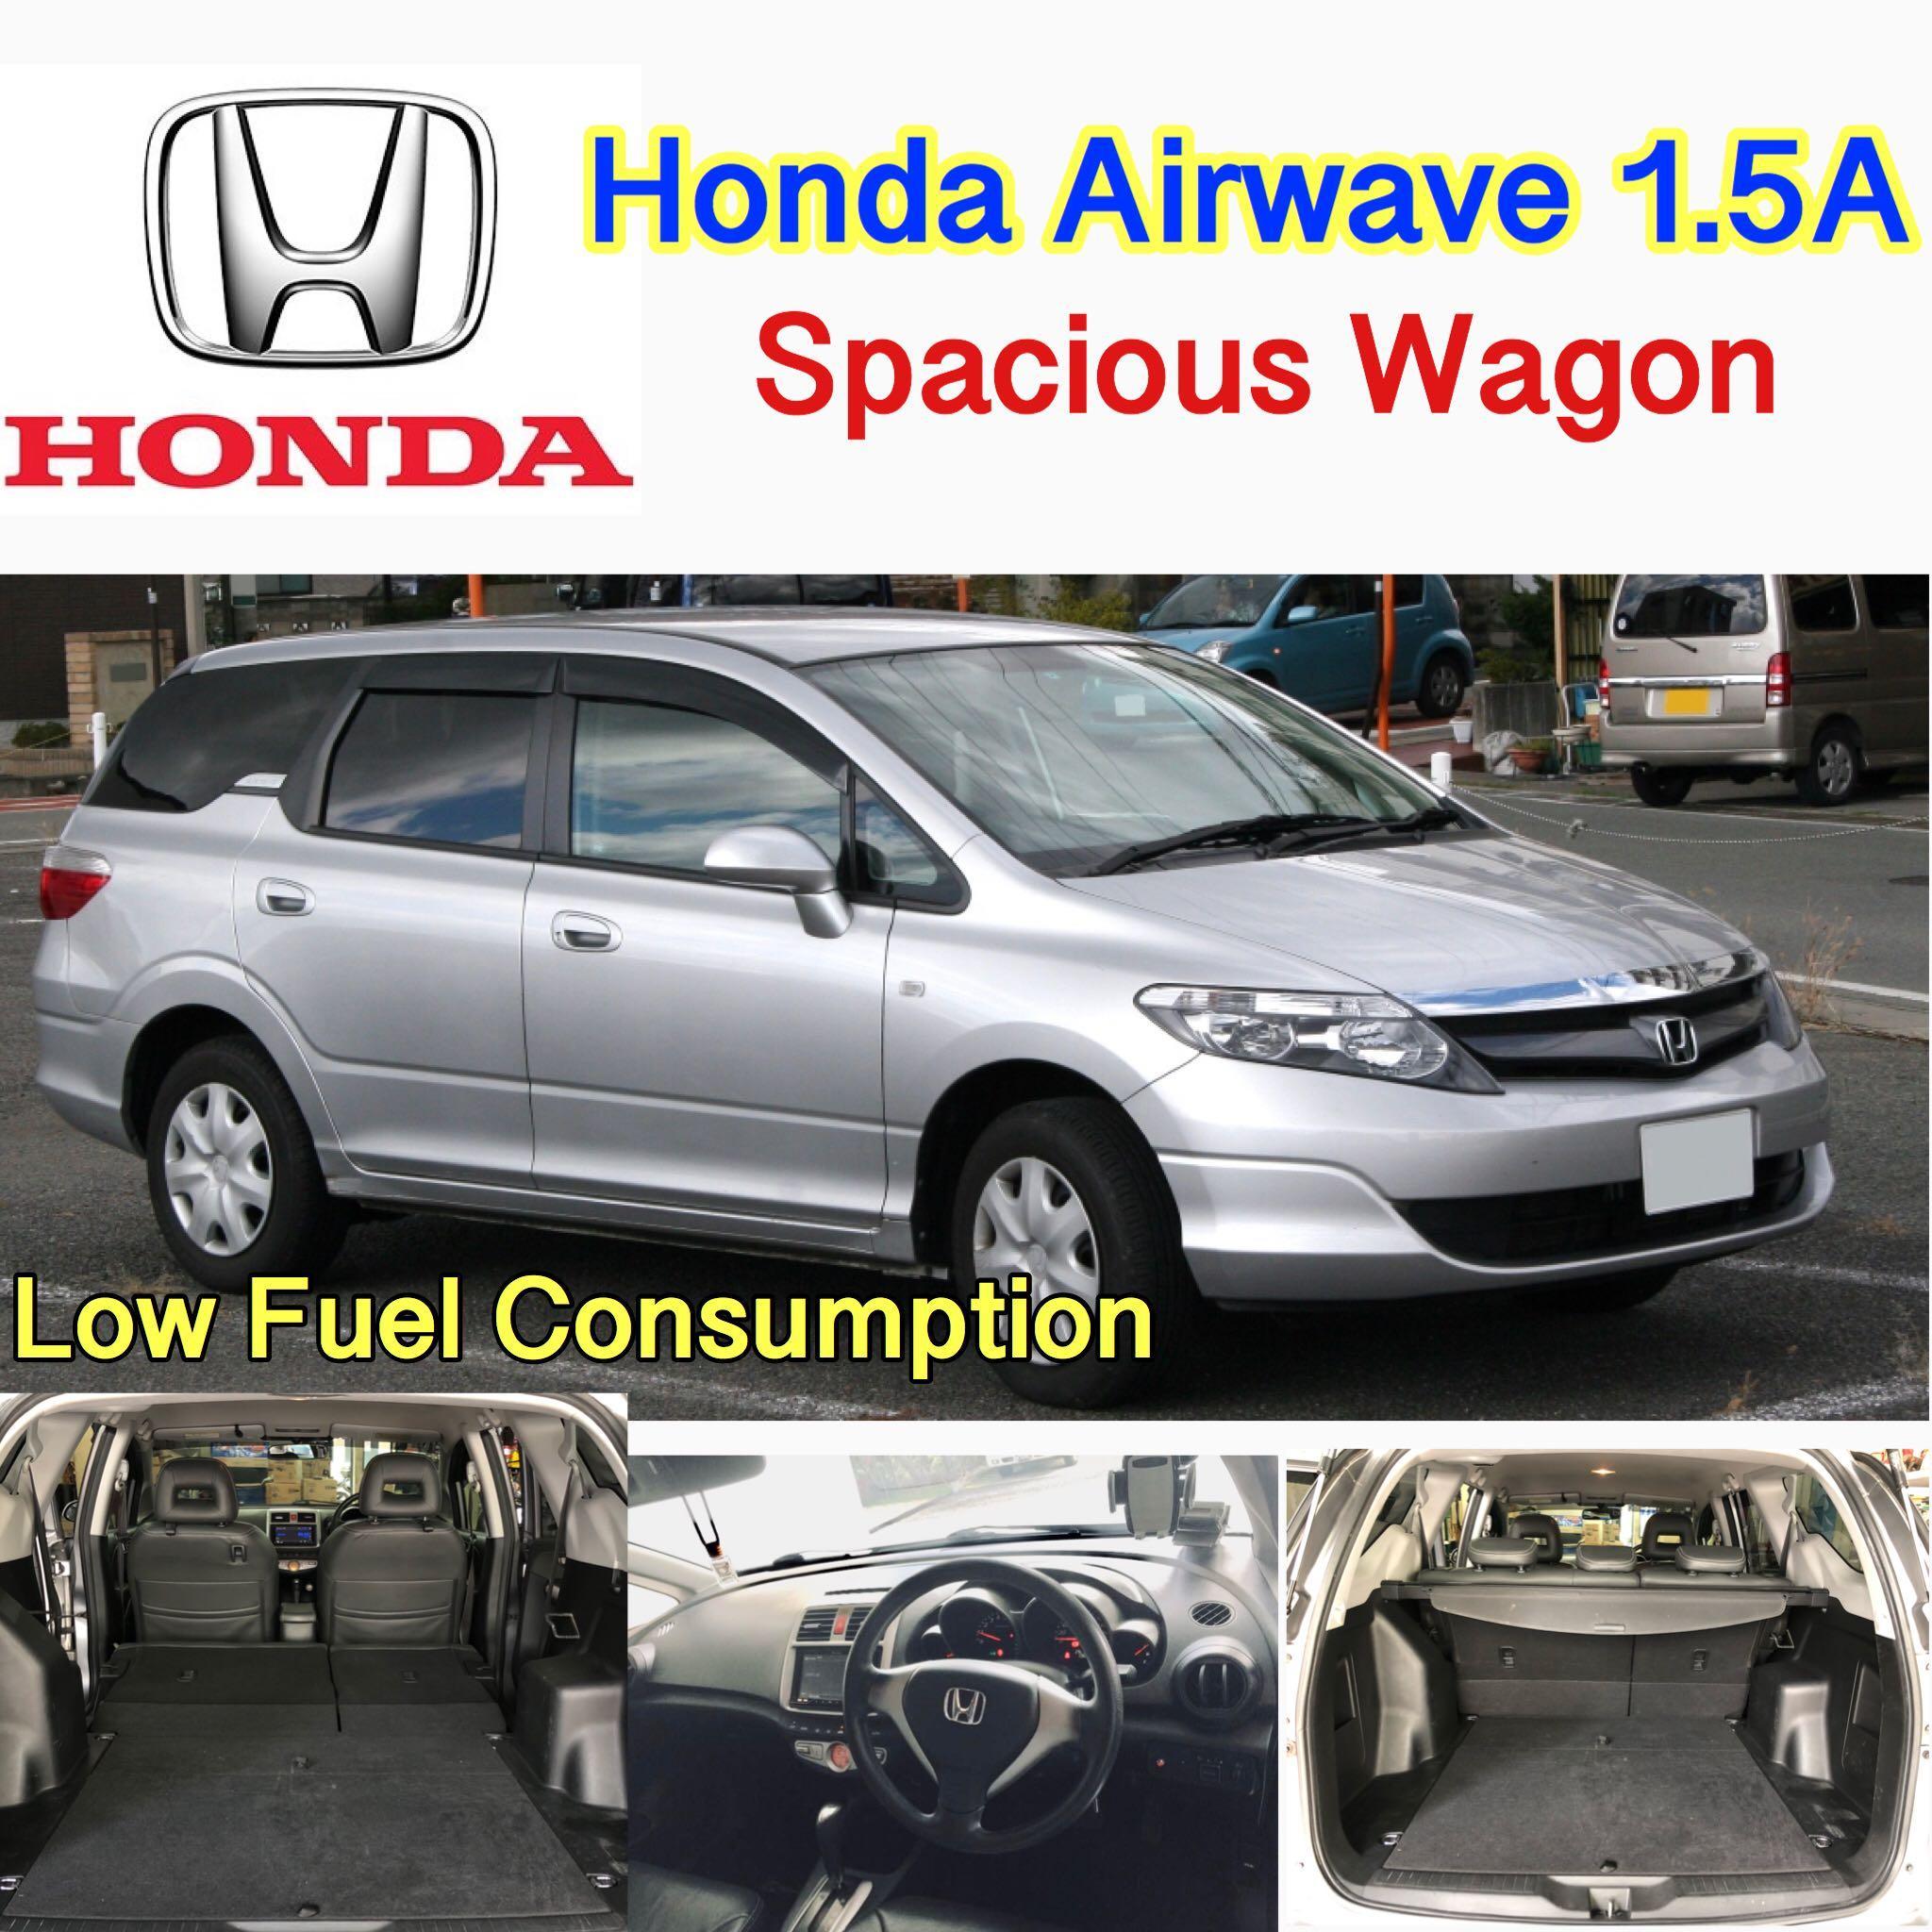 Toyota Alphard Car Rental ✨Toyota Estima MPV($69) ✨Alphard($89) ✨Vezel Hybrid ($79)✨ BMW 120i Convertible($79) ✨BMW 525 ($69) ✨Nissan Latio($49)✨Lexus Super Luxury GS300 ($79)✨ ✨Stream($59) ✨ Leasing Rent Grab GOJEK Private Hired